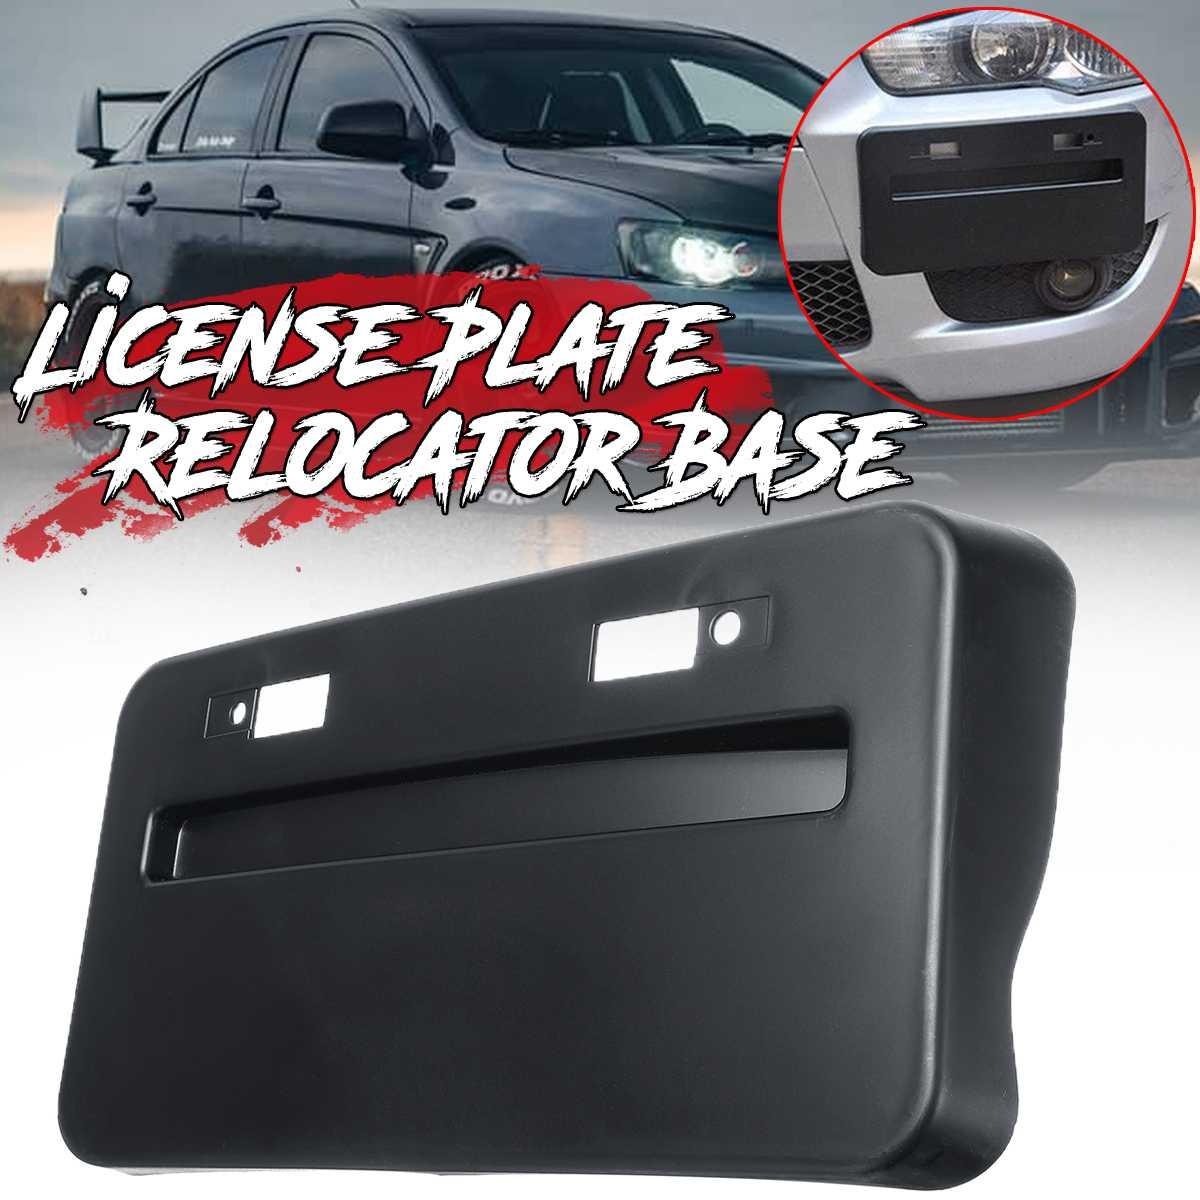 1x Car Front Bumper License Plate Base Frame Relocator Base For Mitsubishi Lancer GTS EVO X 2008-2018 License Plate Bracket